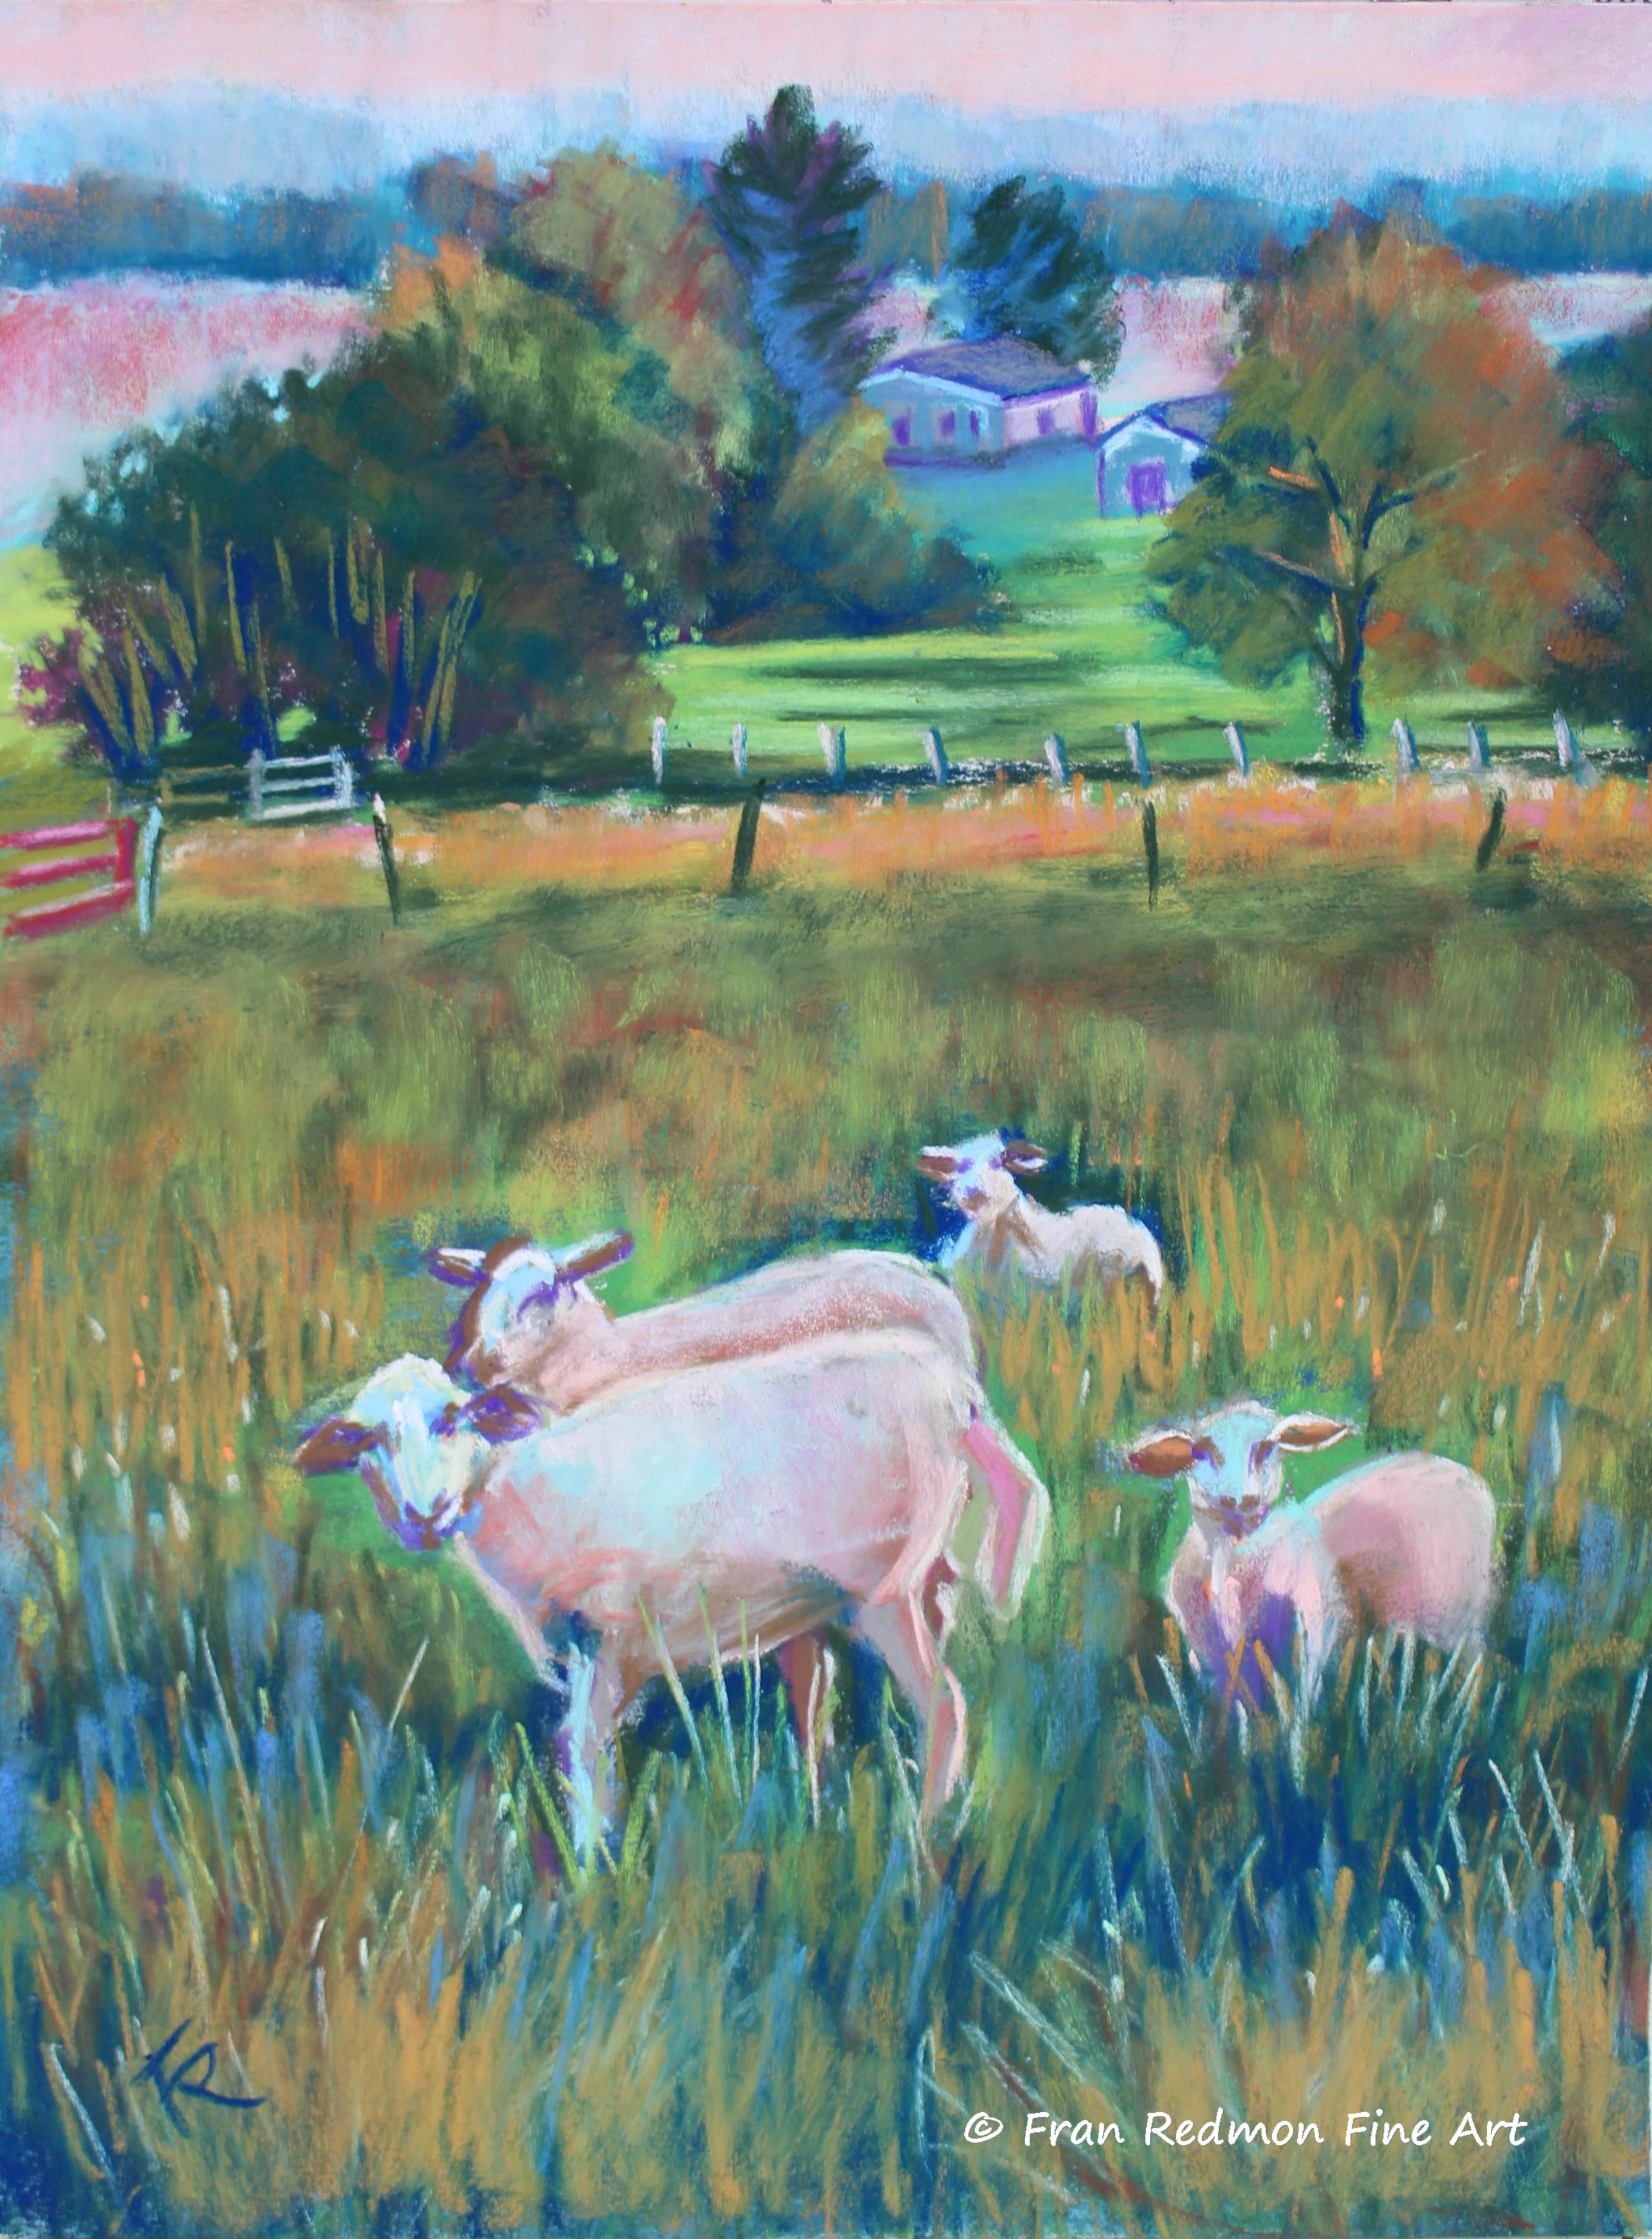 Farmer Joe's Sheep